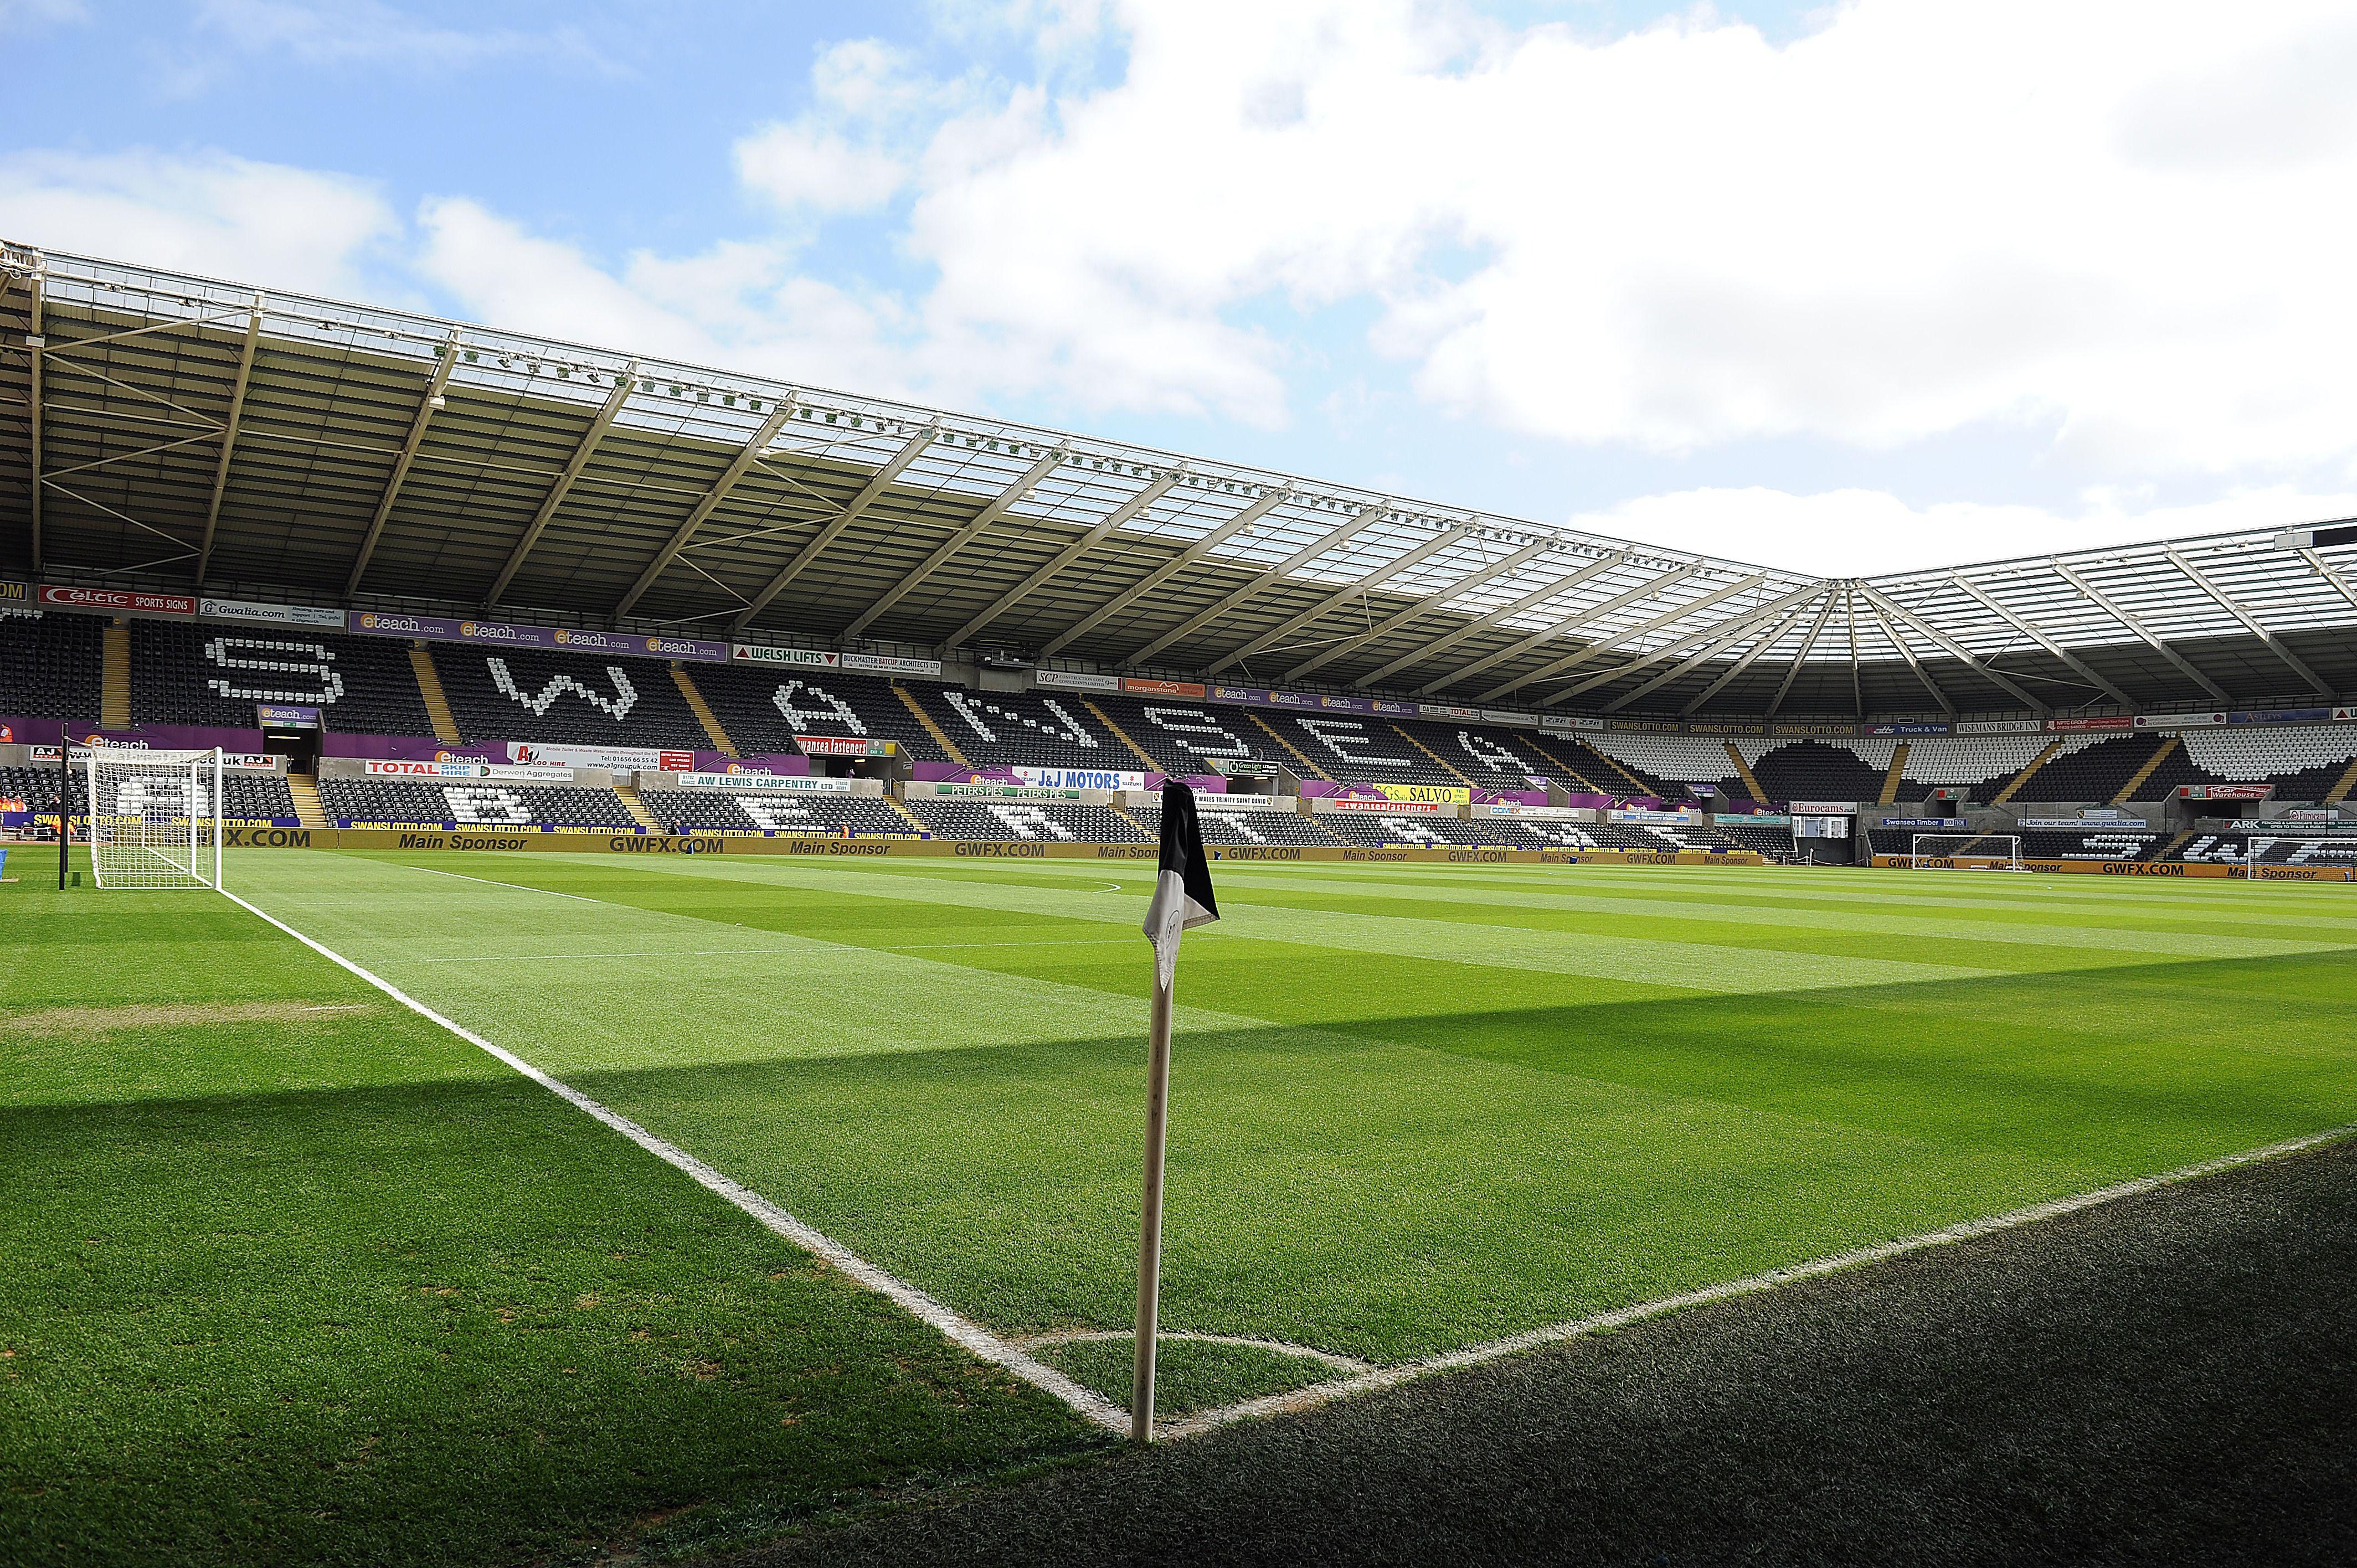 Swansea Liberty Stadium 9ine Swansea City Swansea City